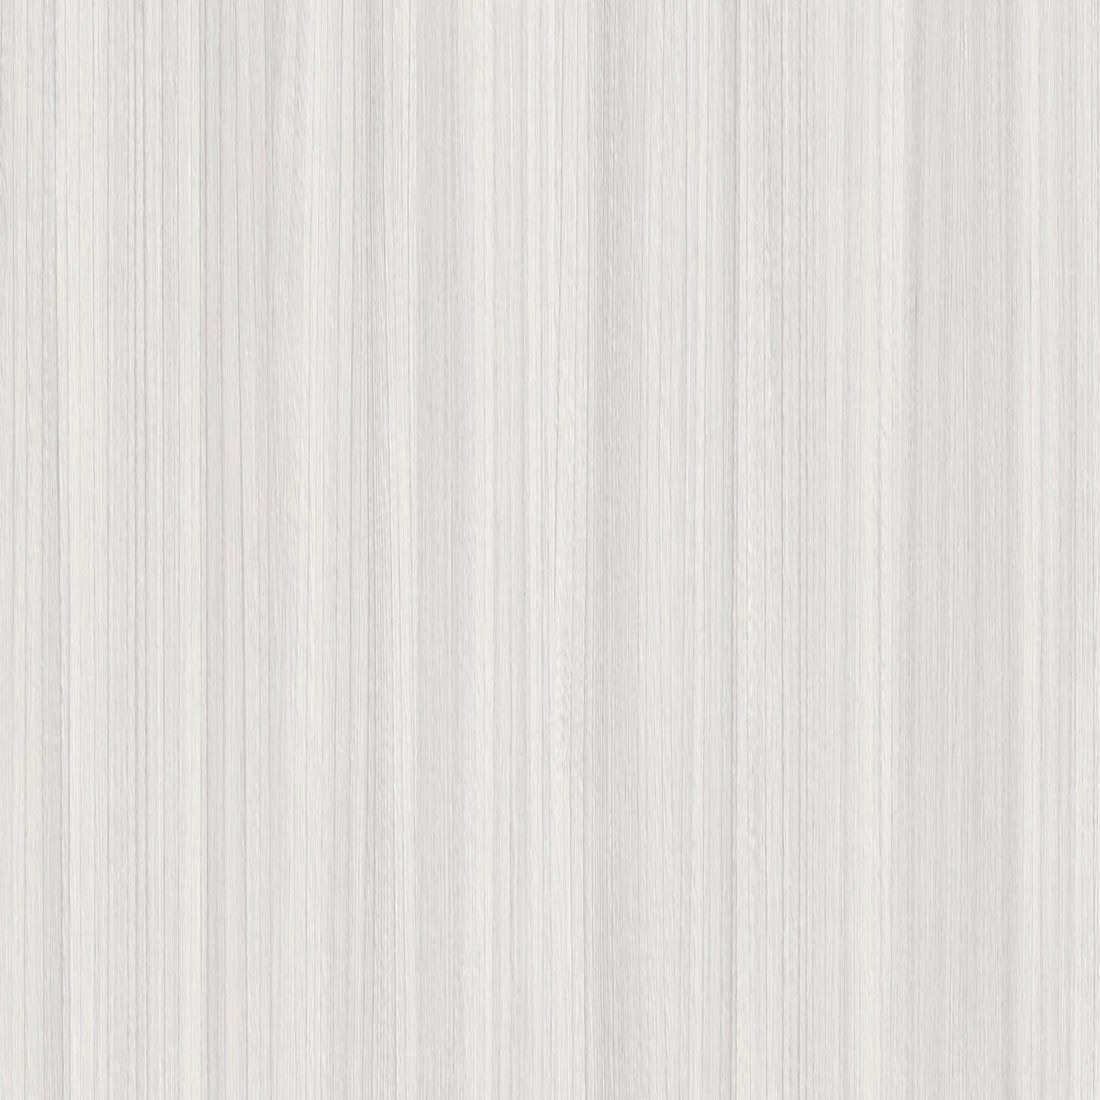 Papel parede madeira cinza claro adesivo contact m veis - Papel para revestir paredes ...